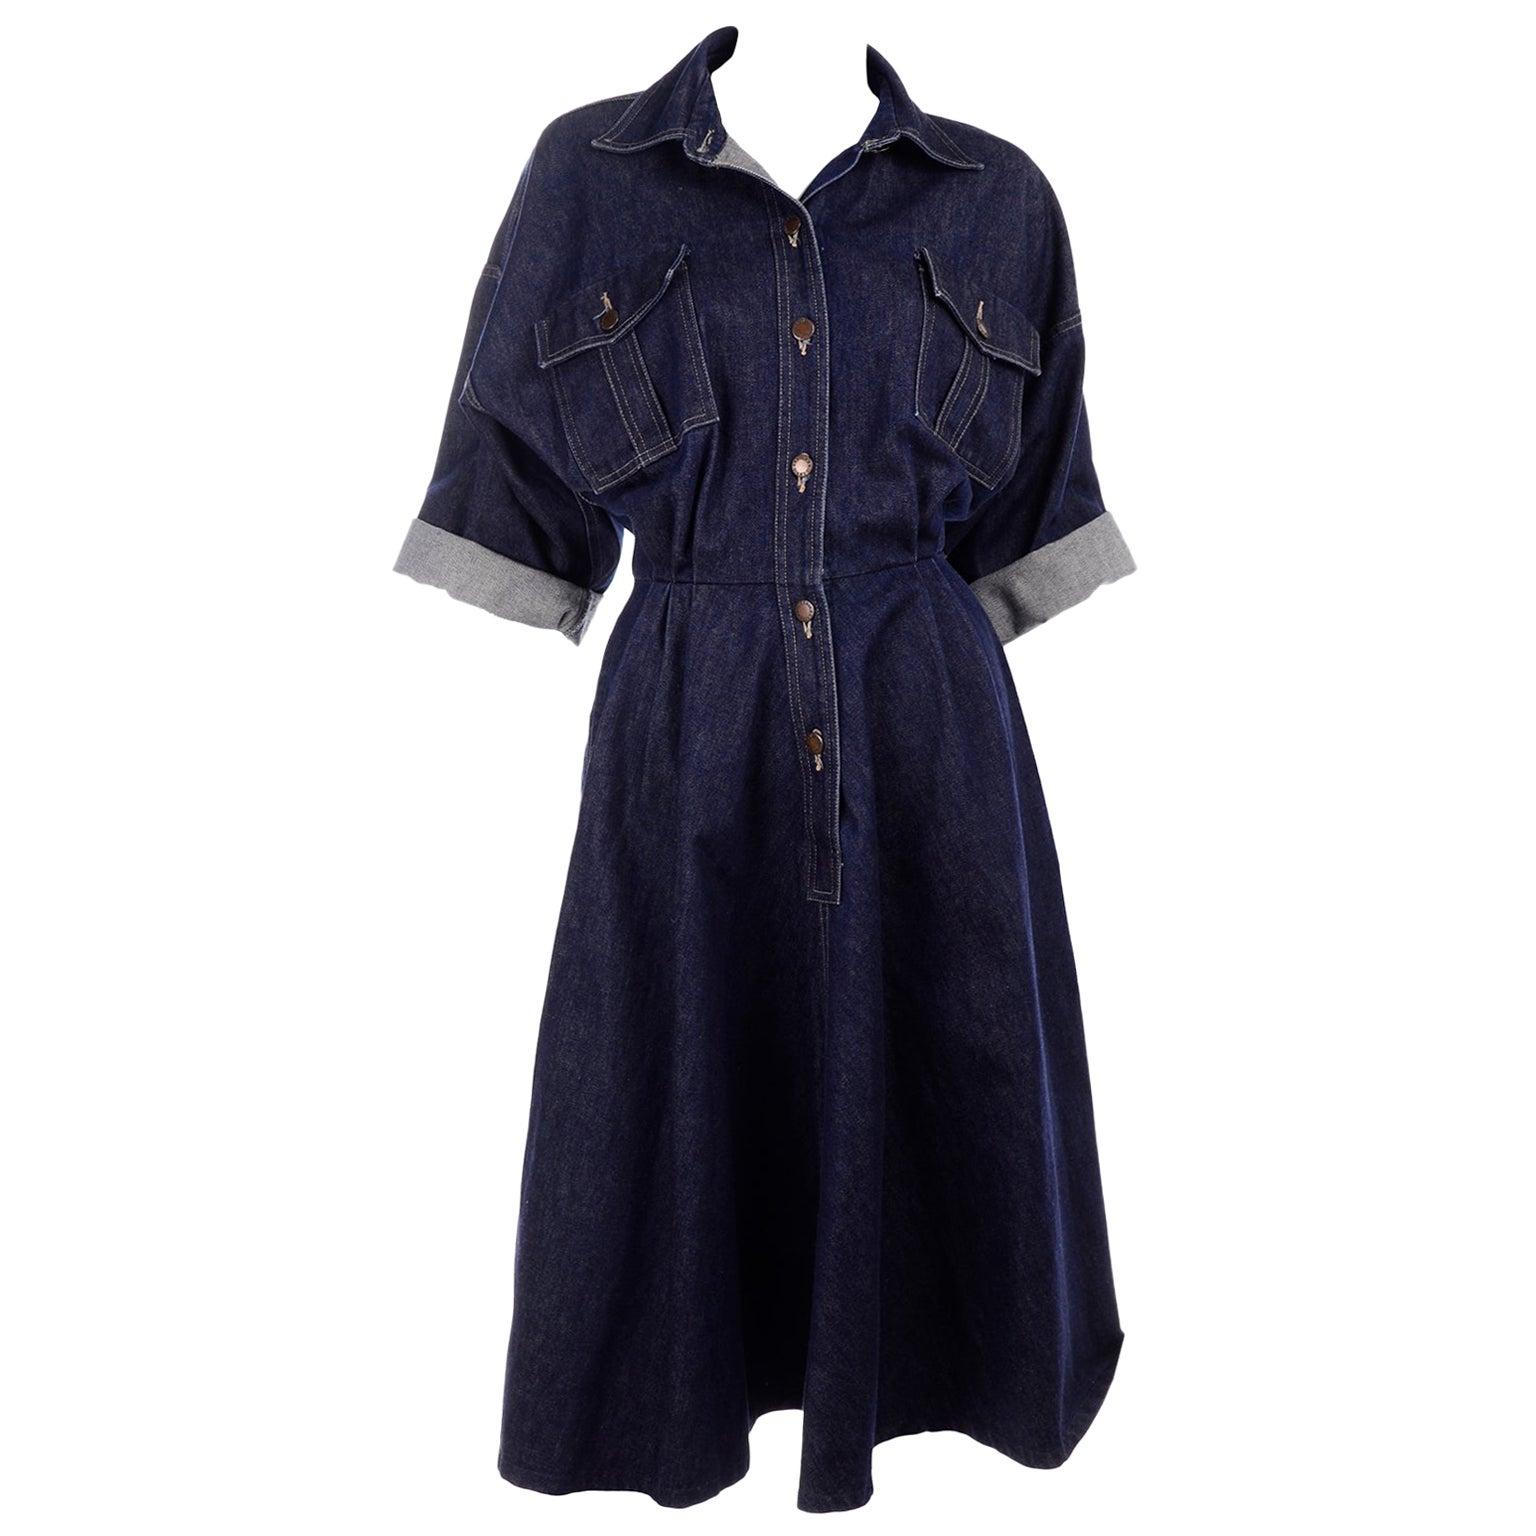 Norma Kamali OMO 1980s Vintage Dark Blue Denim Dress